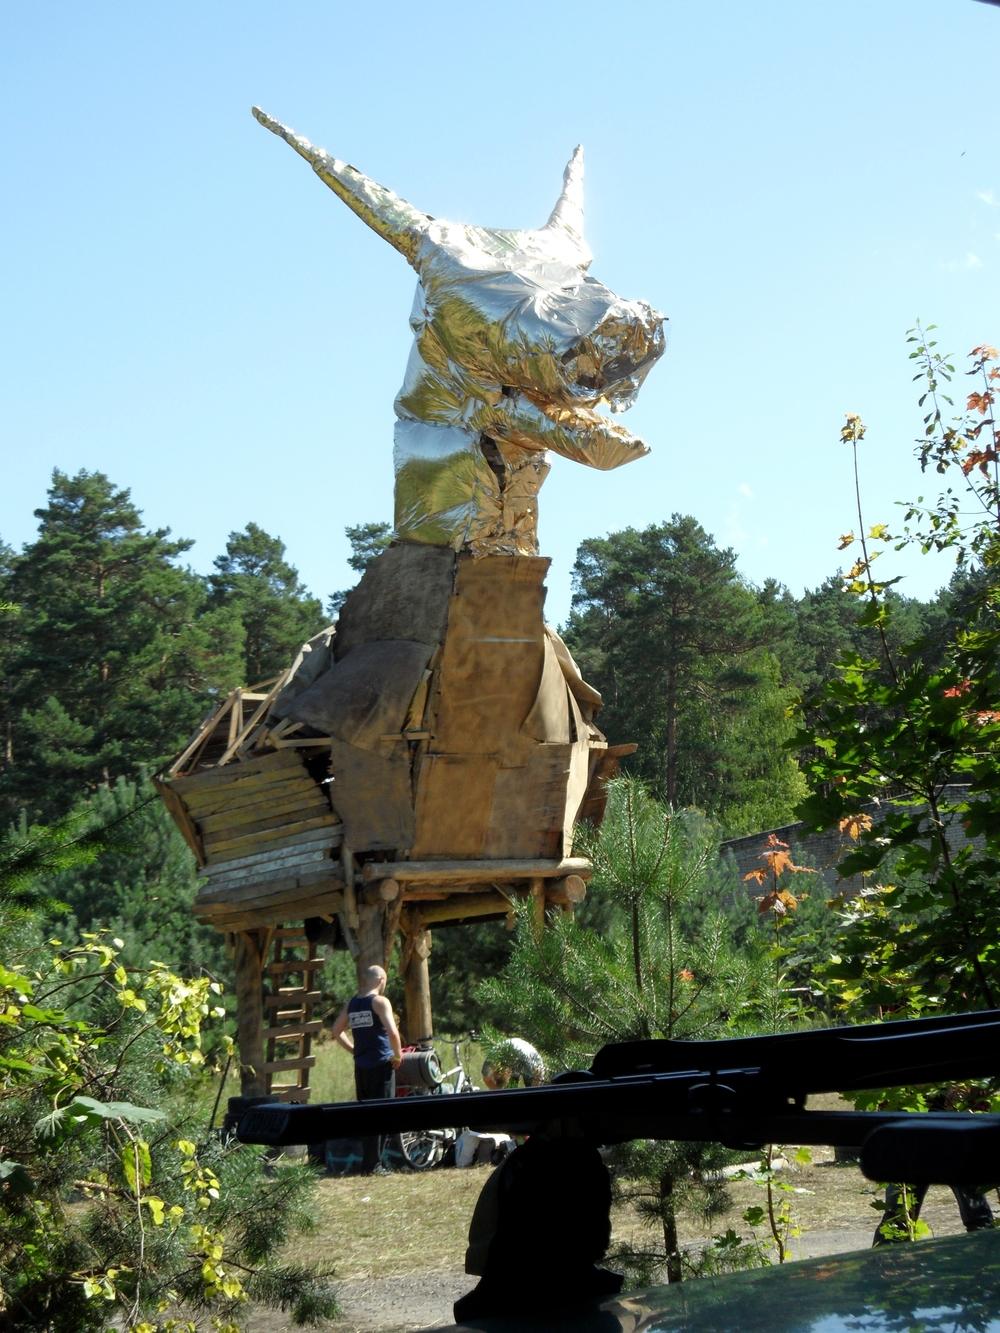 The golden Goat at Artbase 2011